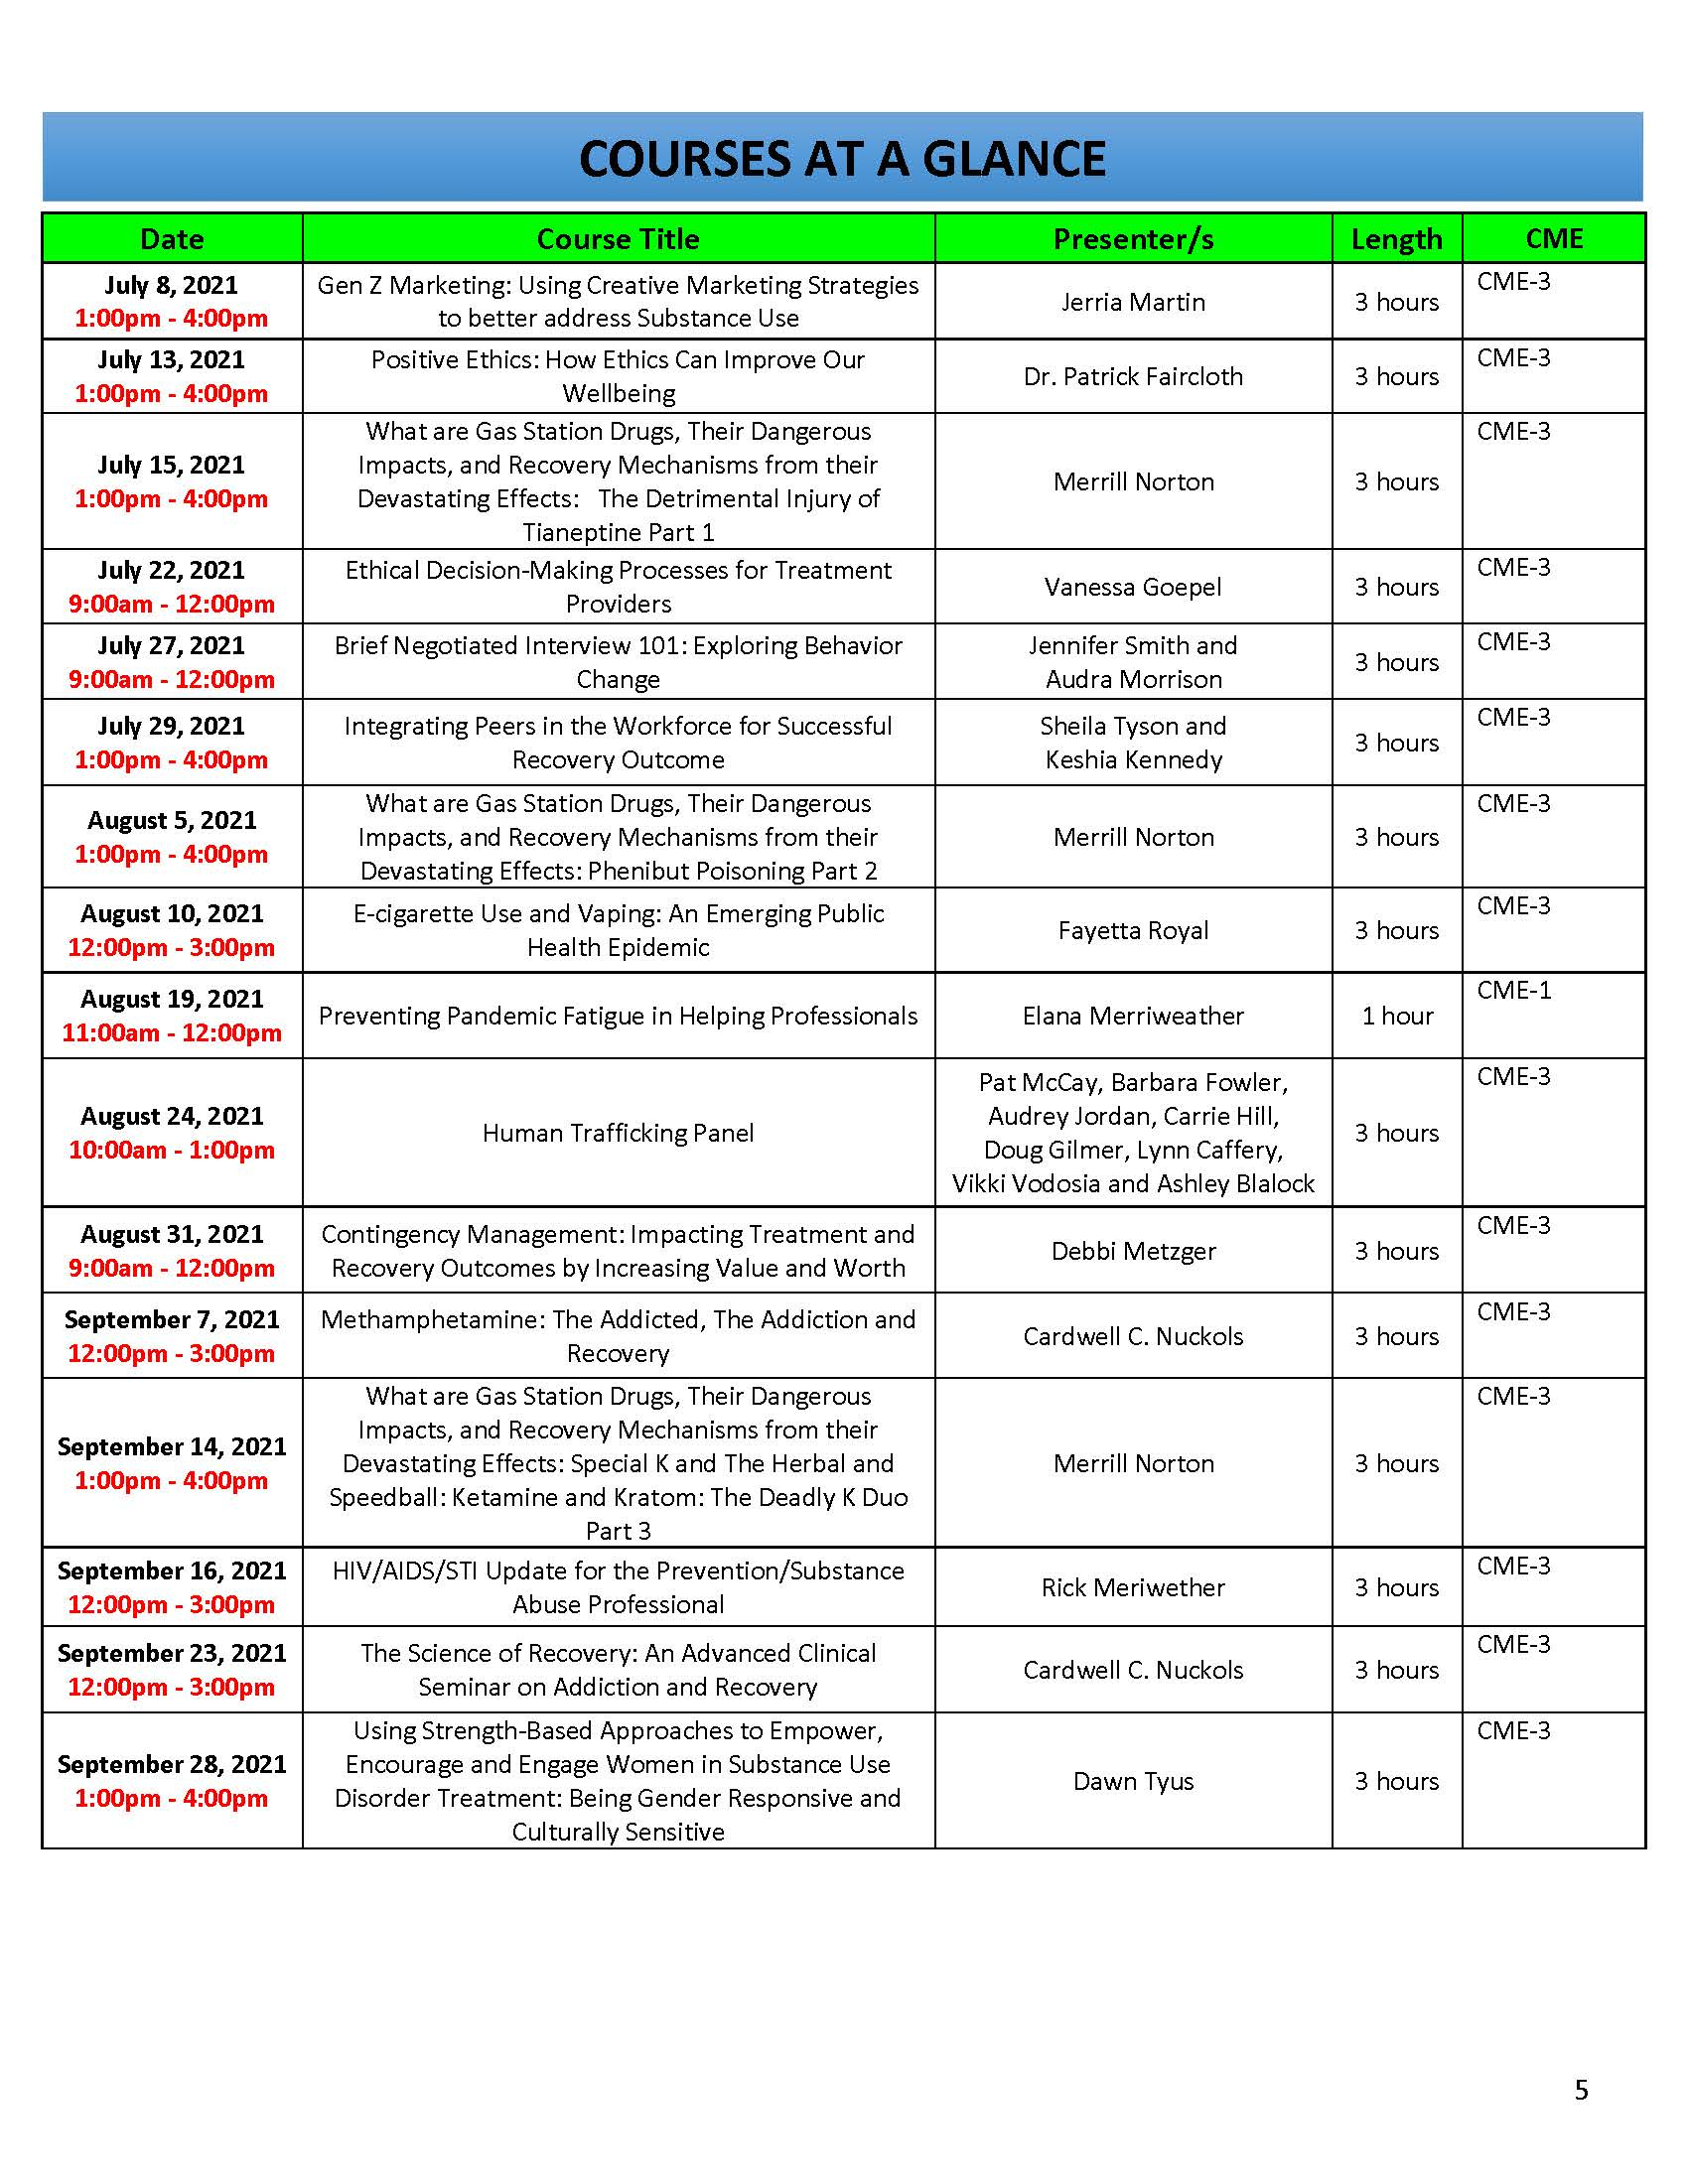 ASADS Jul-Sept. 2021 Courses